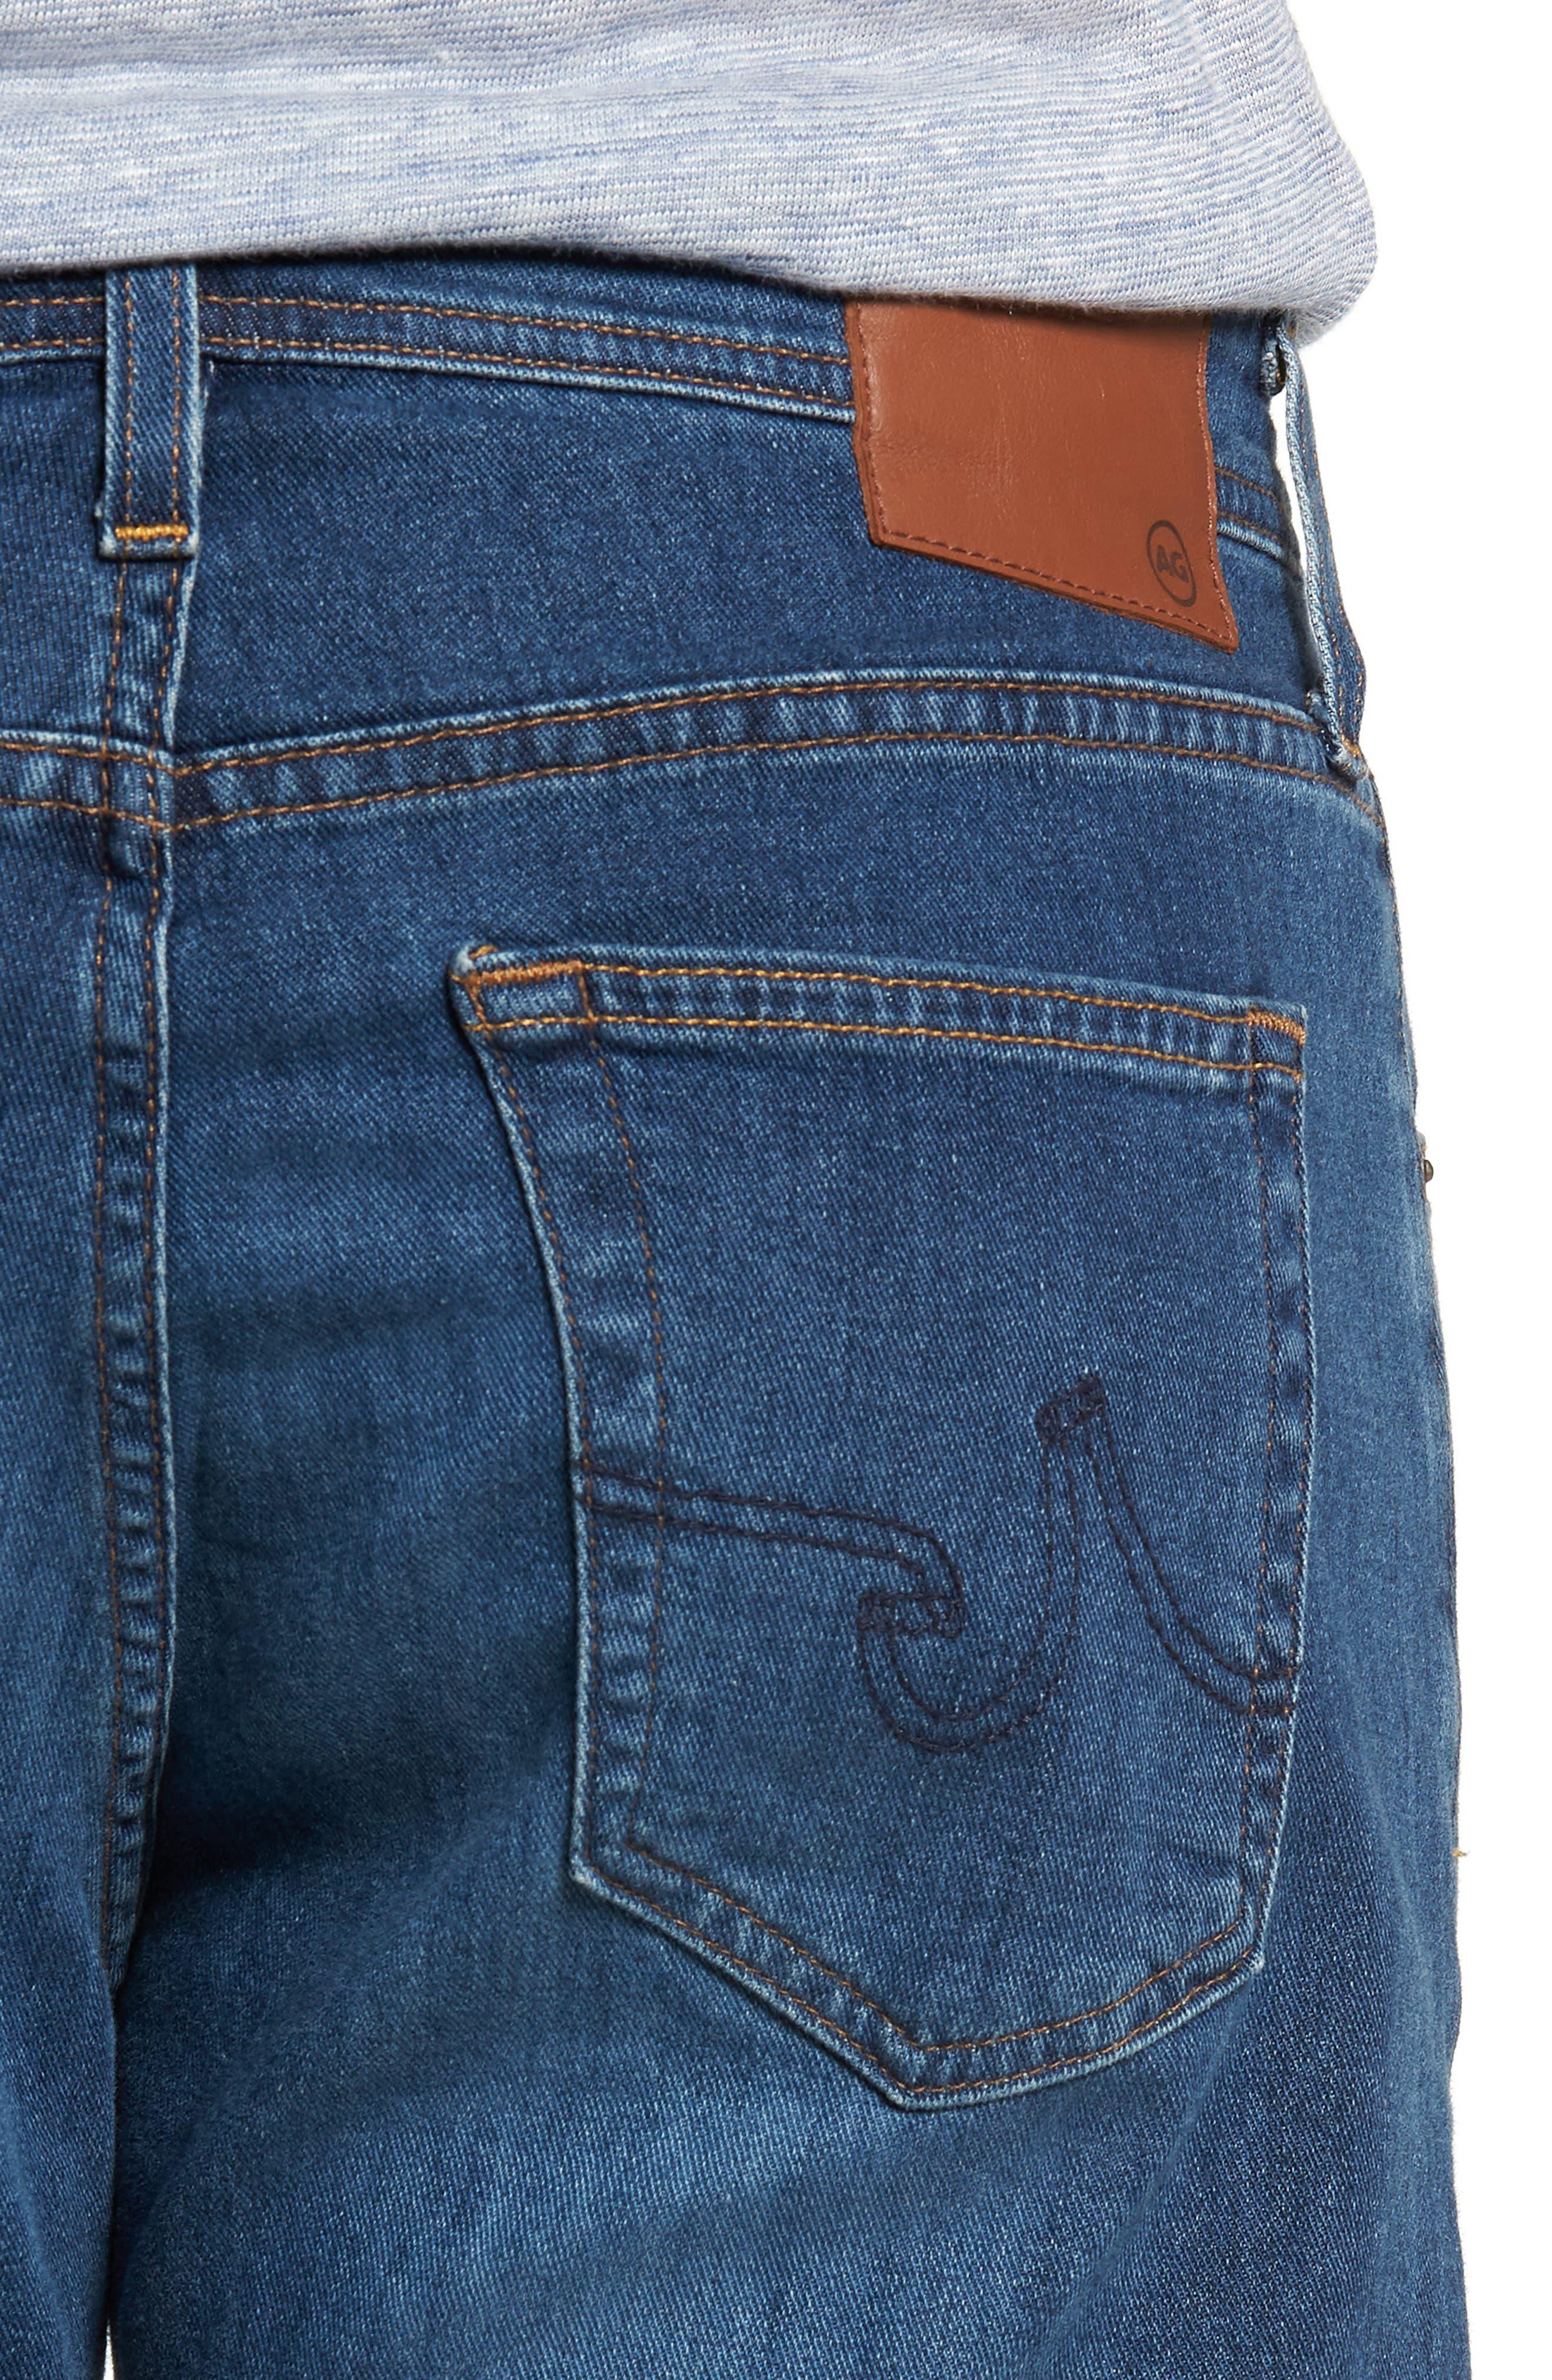 Ives Straight Leg Jeans,                             Alternate thumbnail 4, color,                             EDITION